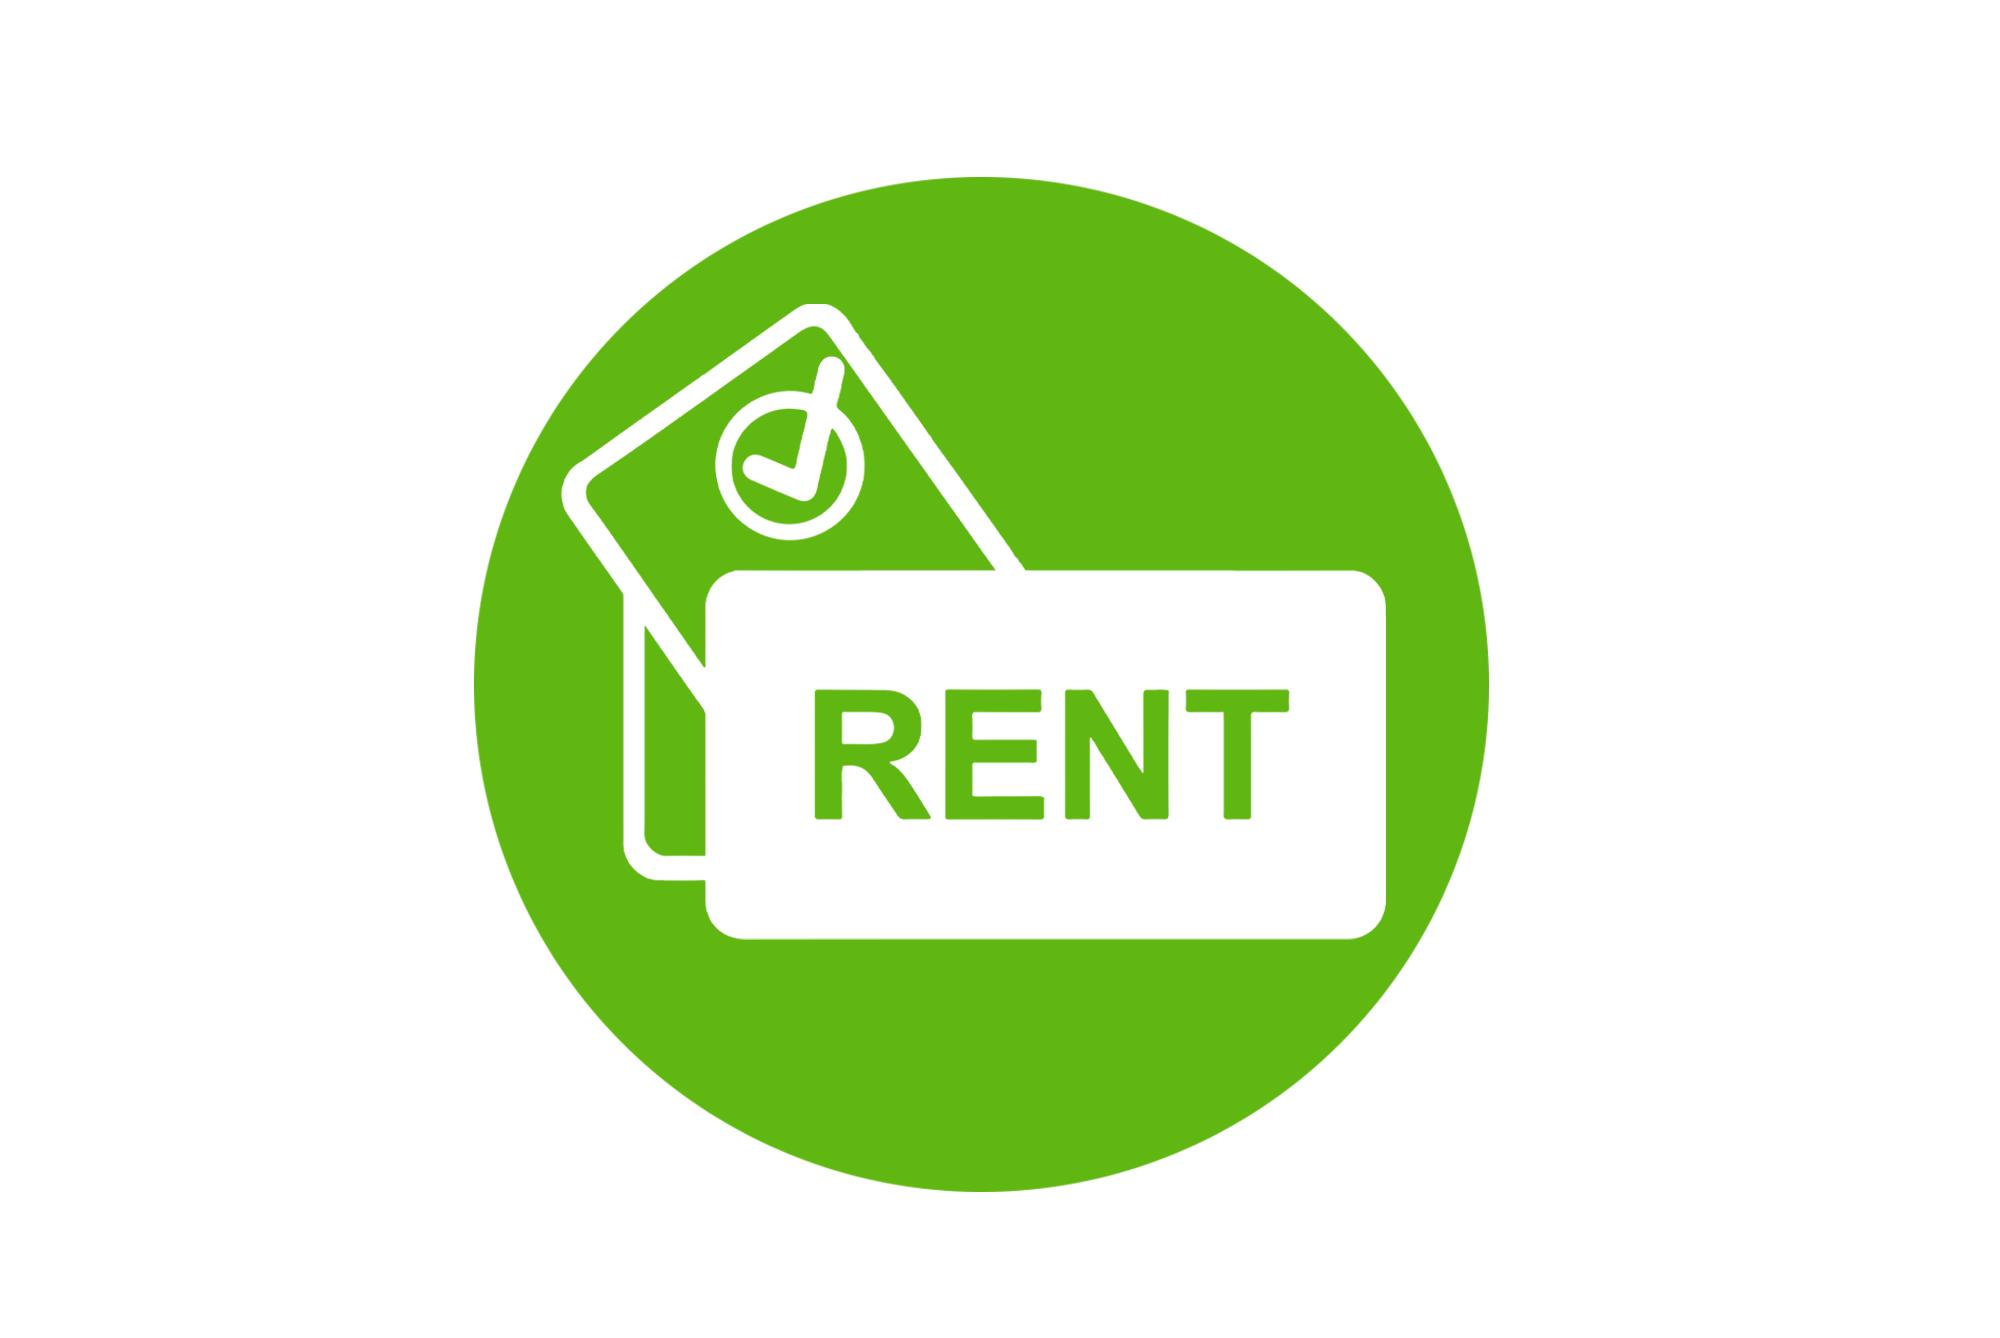 PMG-Icon-Rent-grün